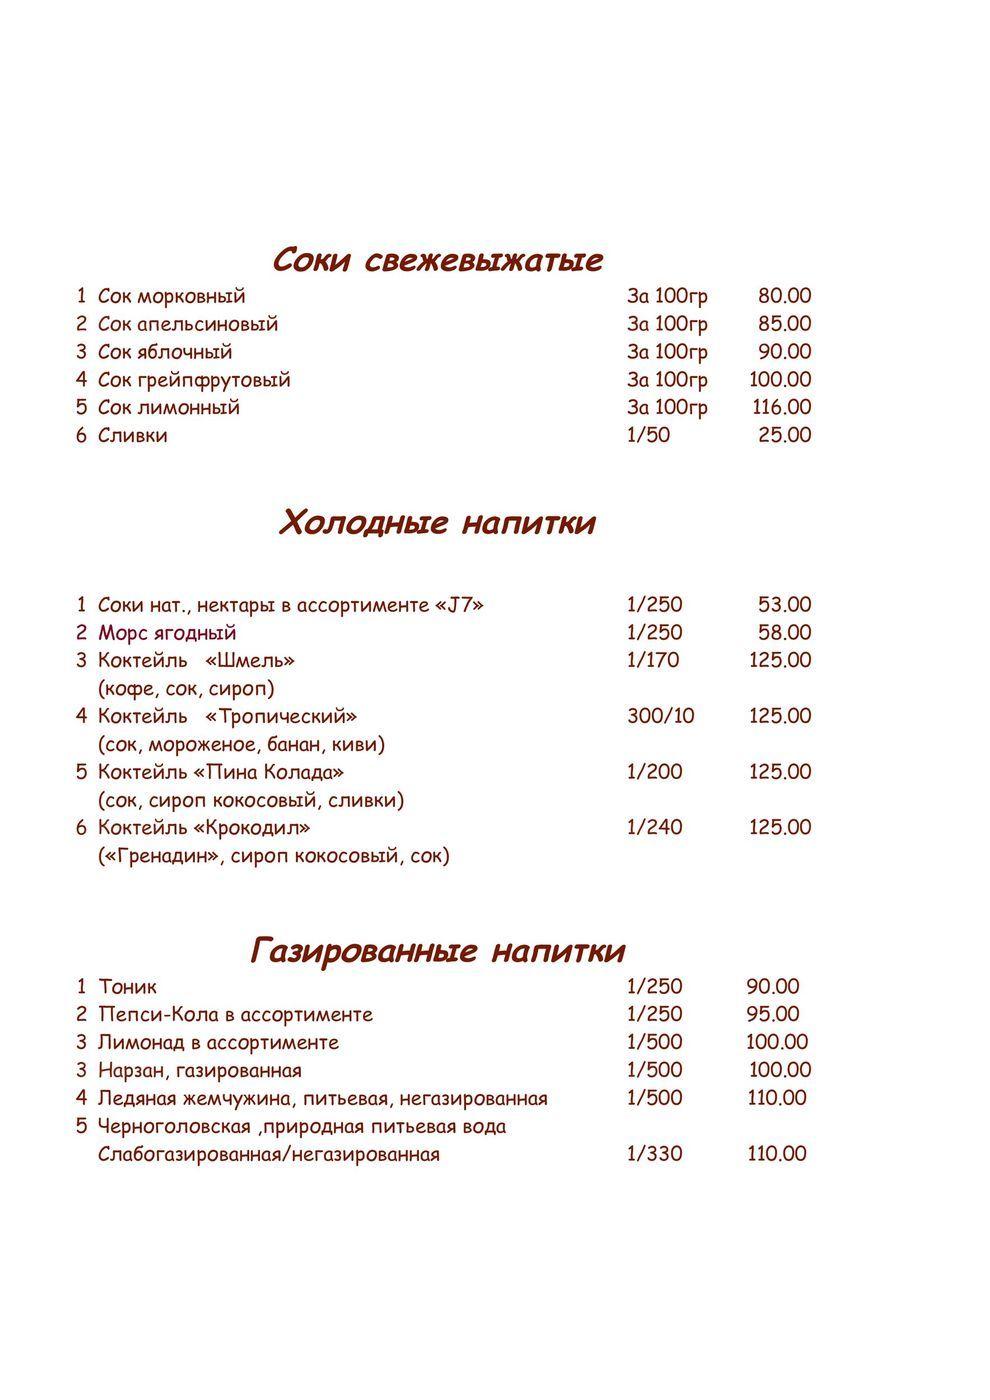 Меню кафе Мельба на улице Кирова фото 17